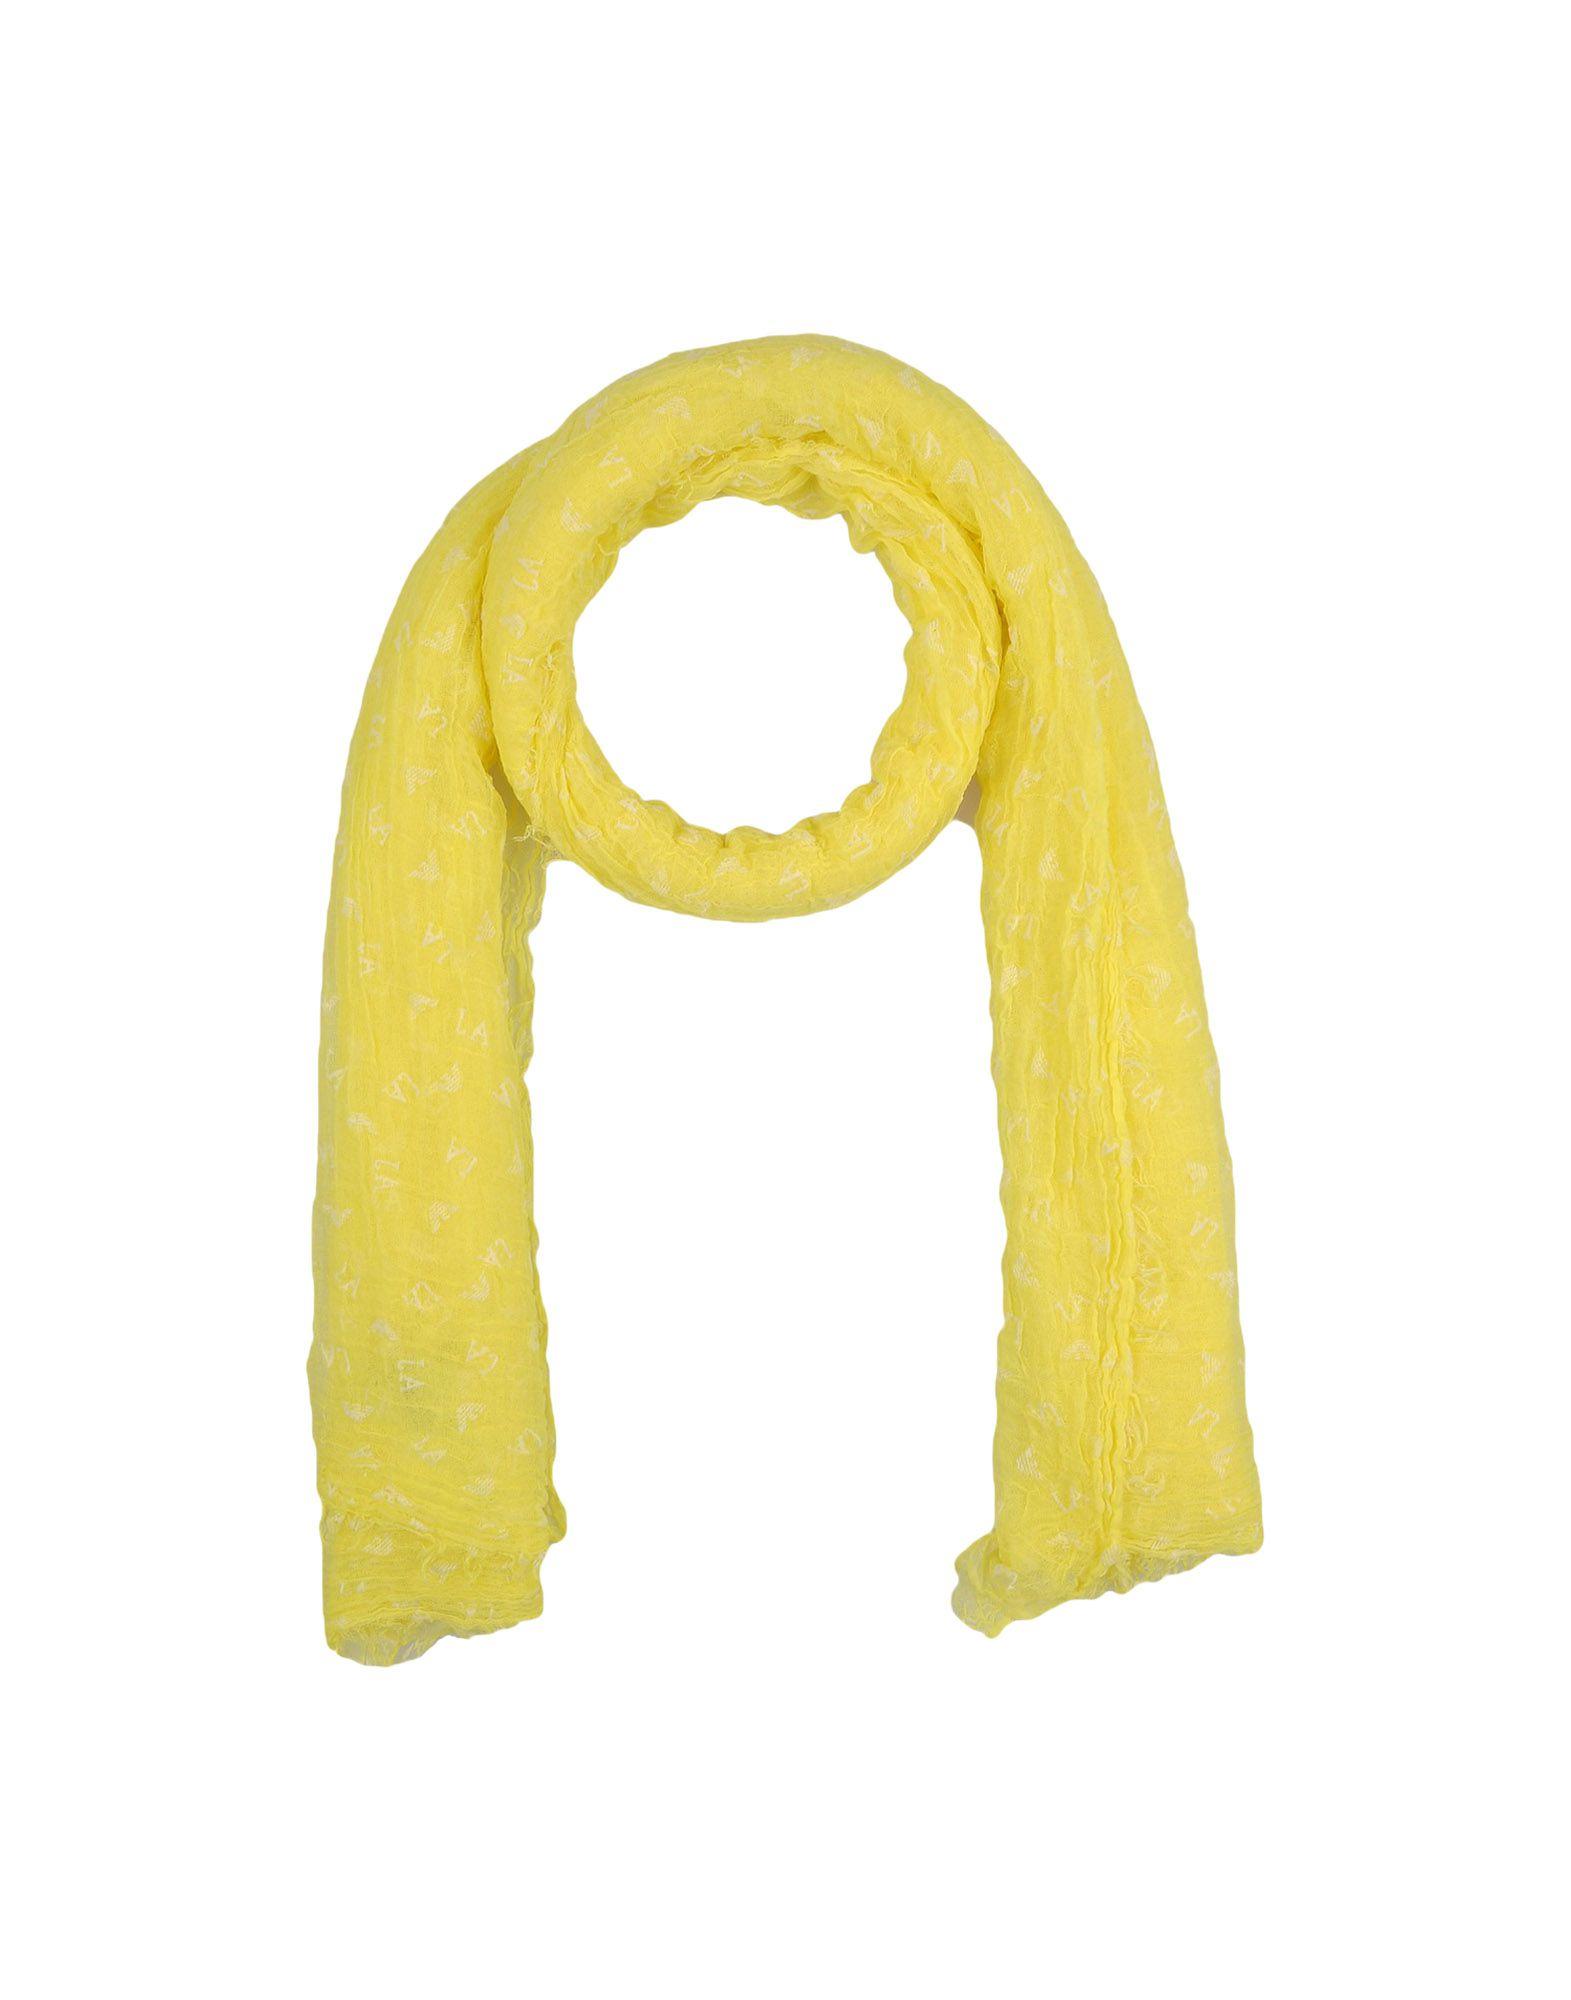 ARMANI JEANS Палантин палантин armani jeans 924029 6a025 31835